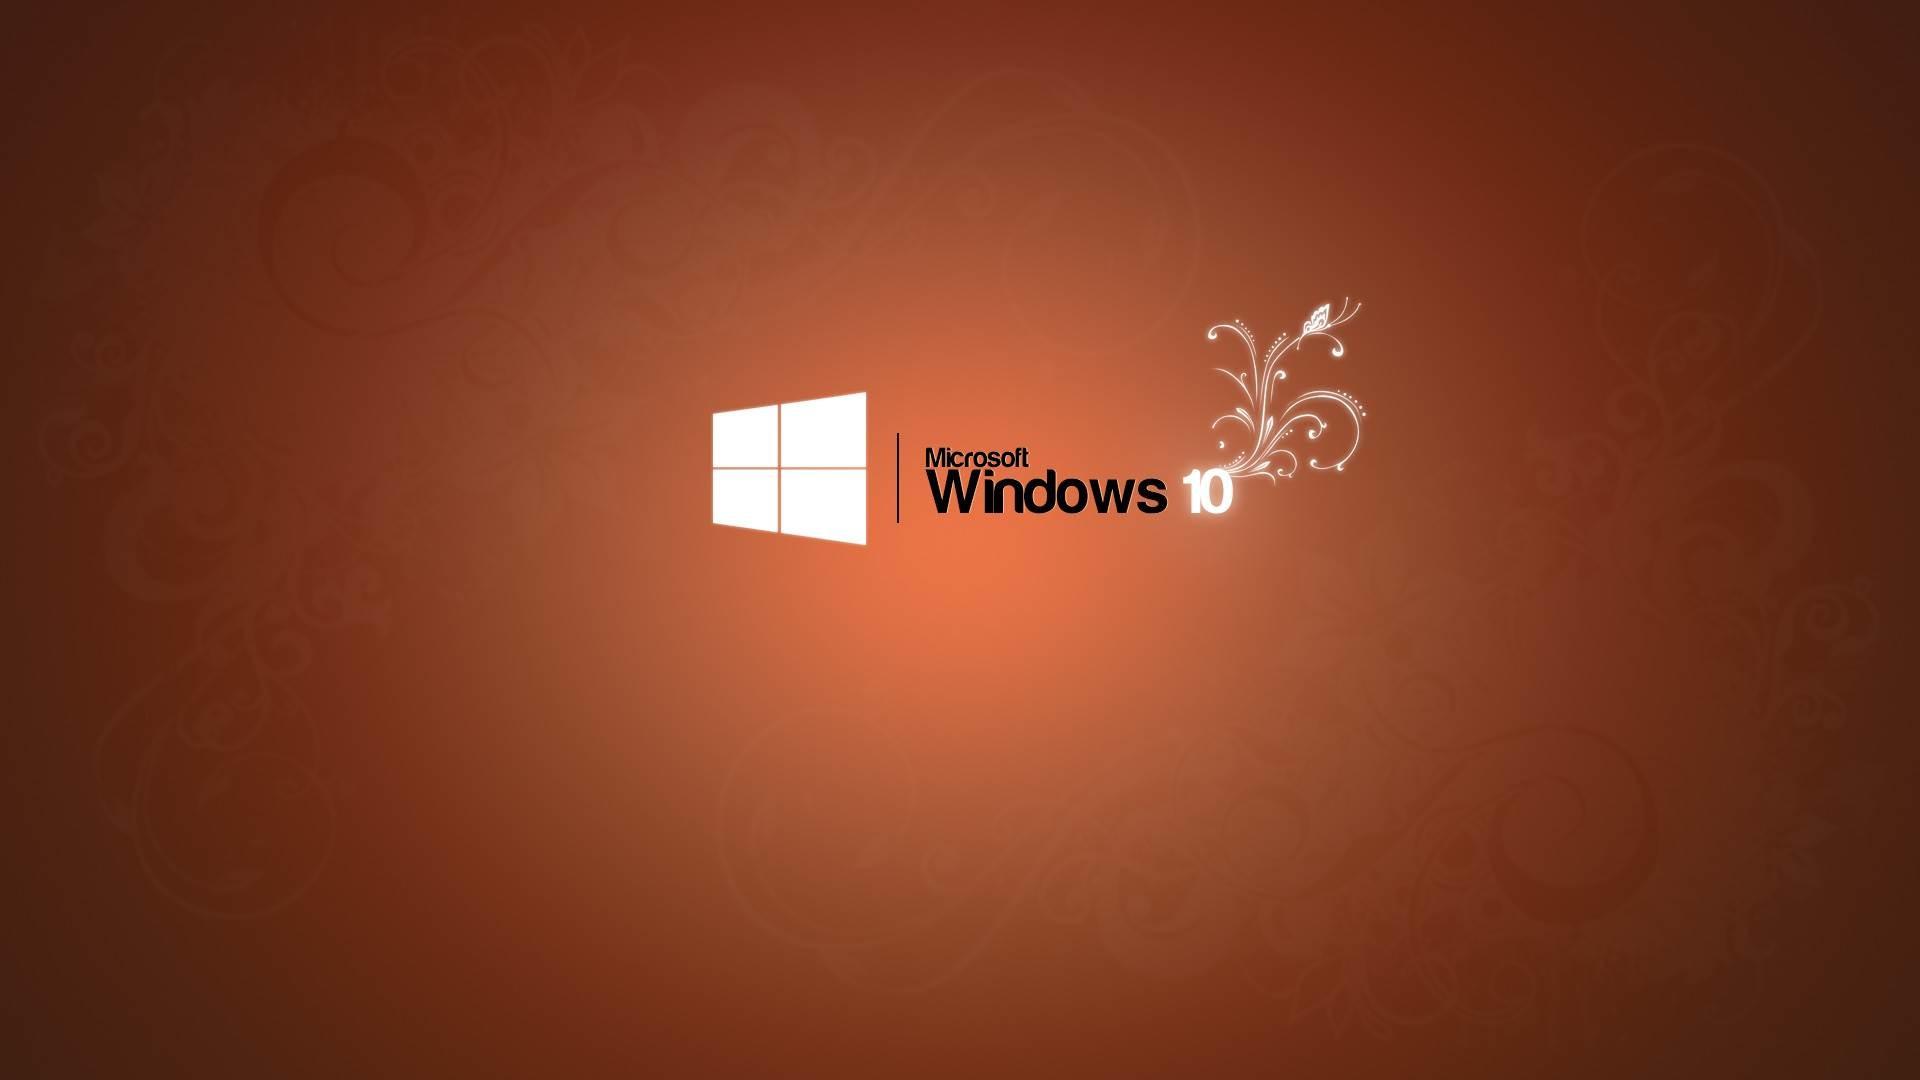 Windows 10 Wallpaper | HD Wallpapers, Backgrounds, Images, Art Photos. Top  10